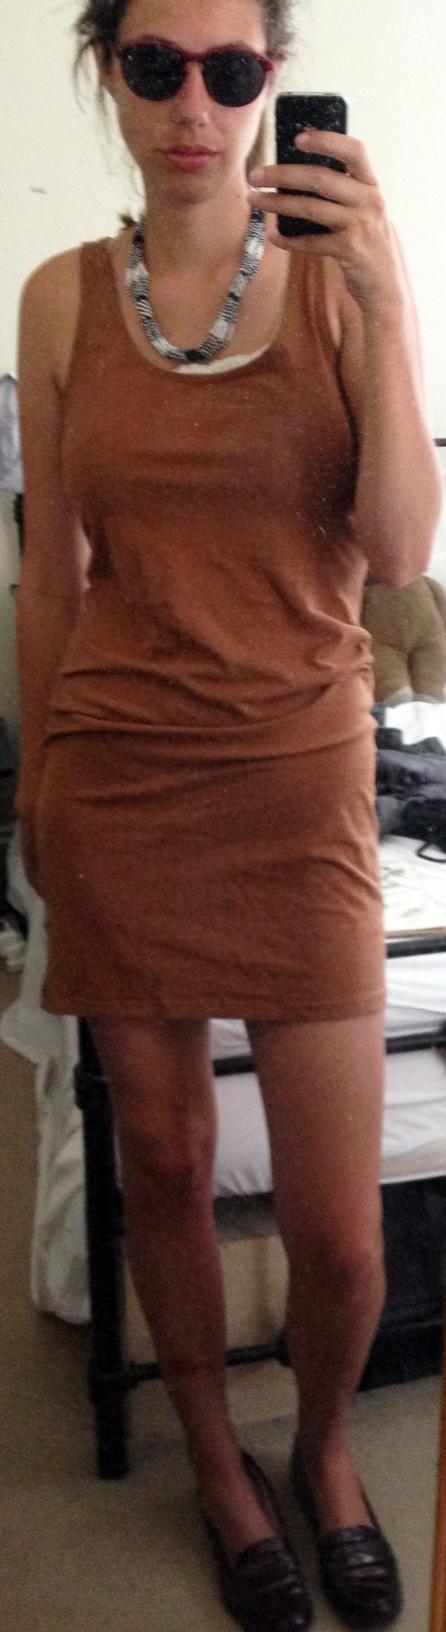 Black + White Statement Necklace ,  Brown Round Sunglasses ,  L.K.Bennett Loafers , Nude Cotton Slip Dress